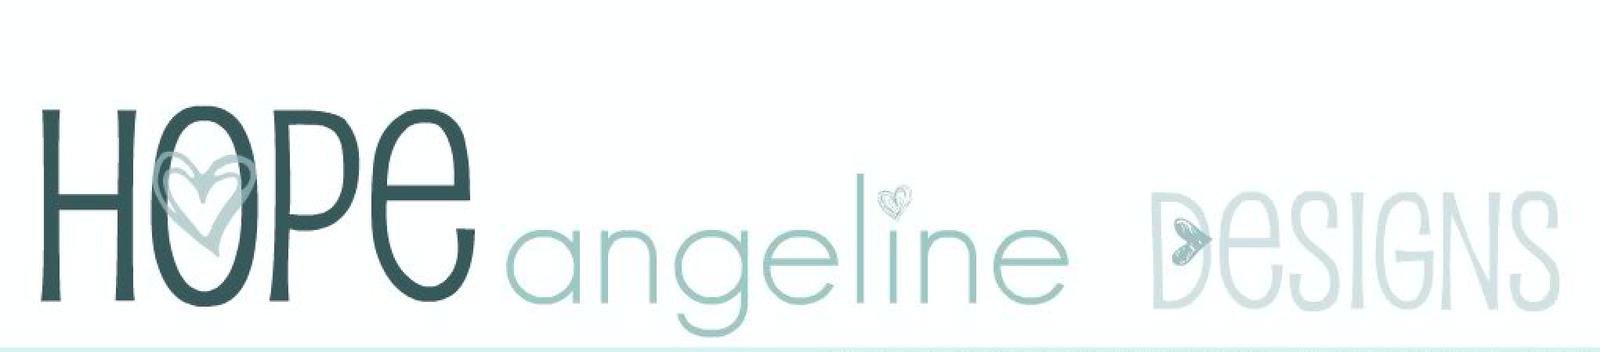 Hope Angeline Designs